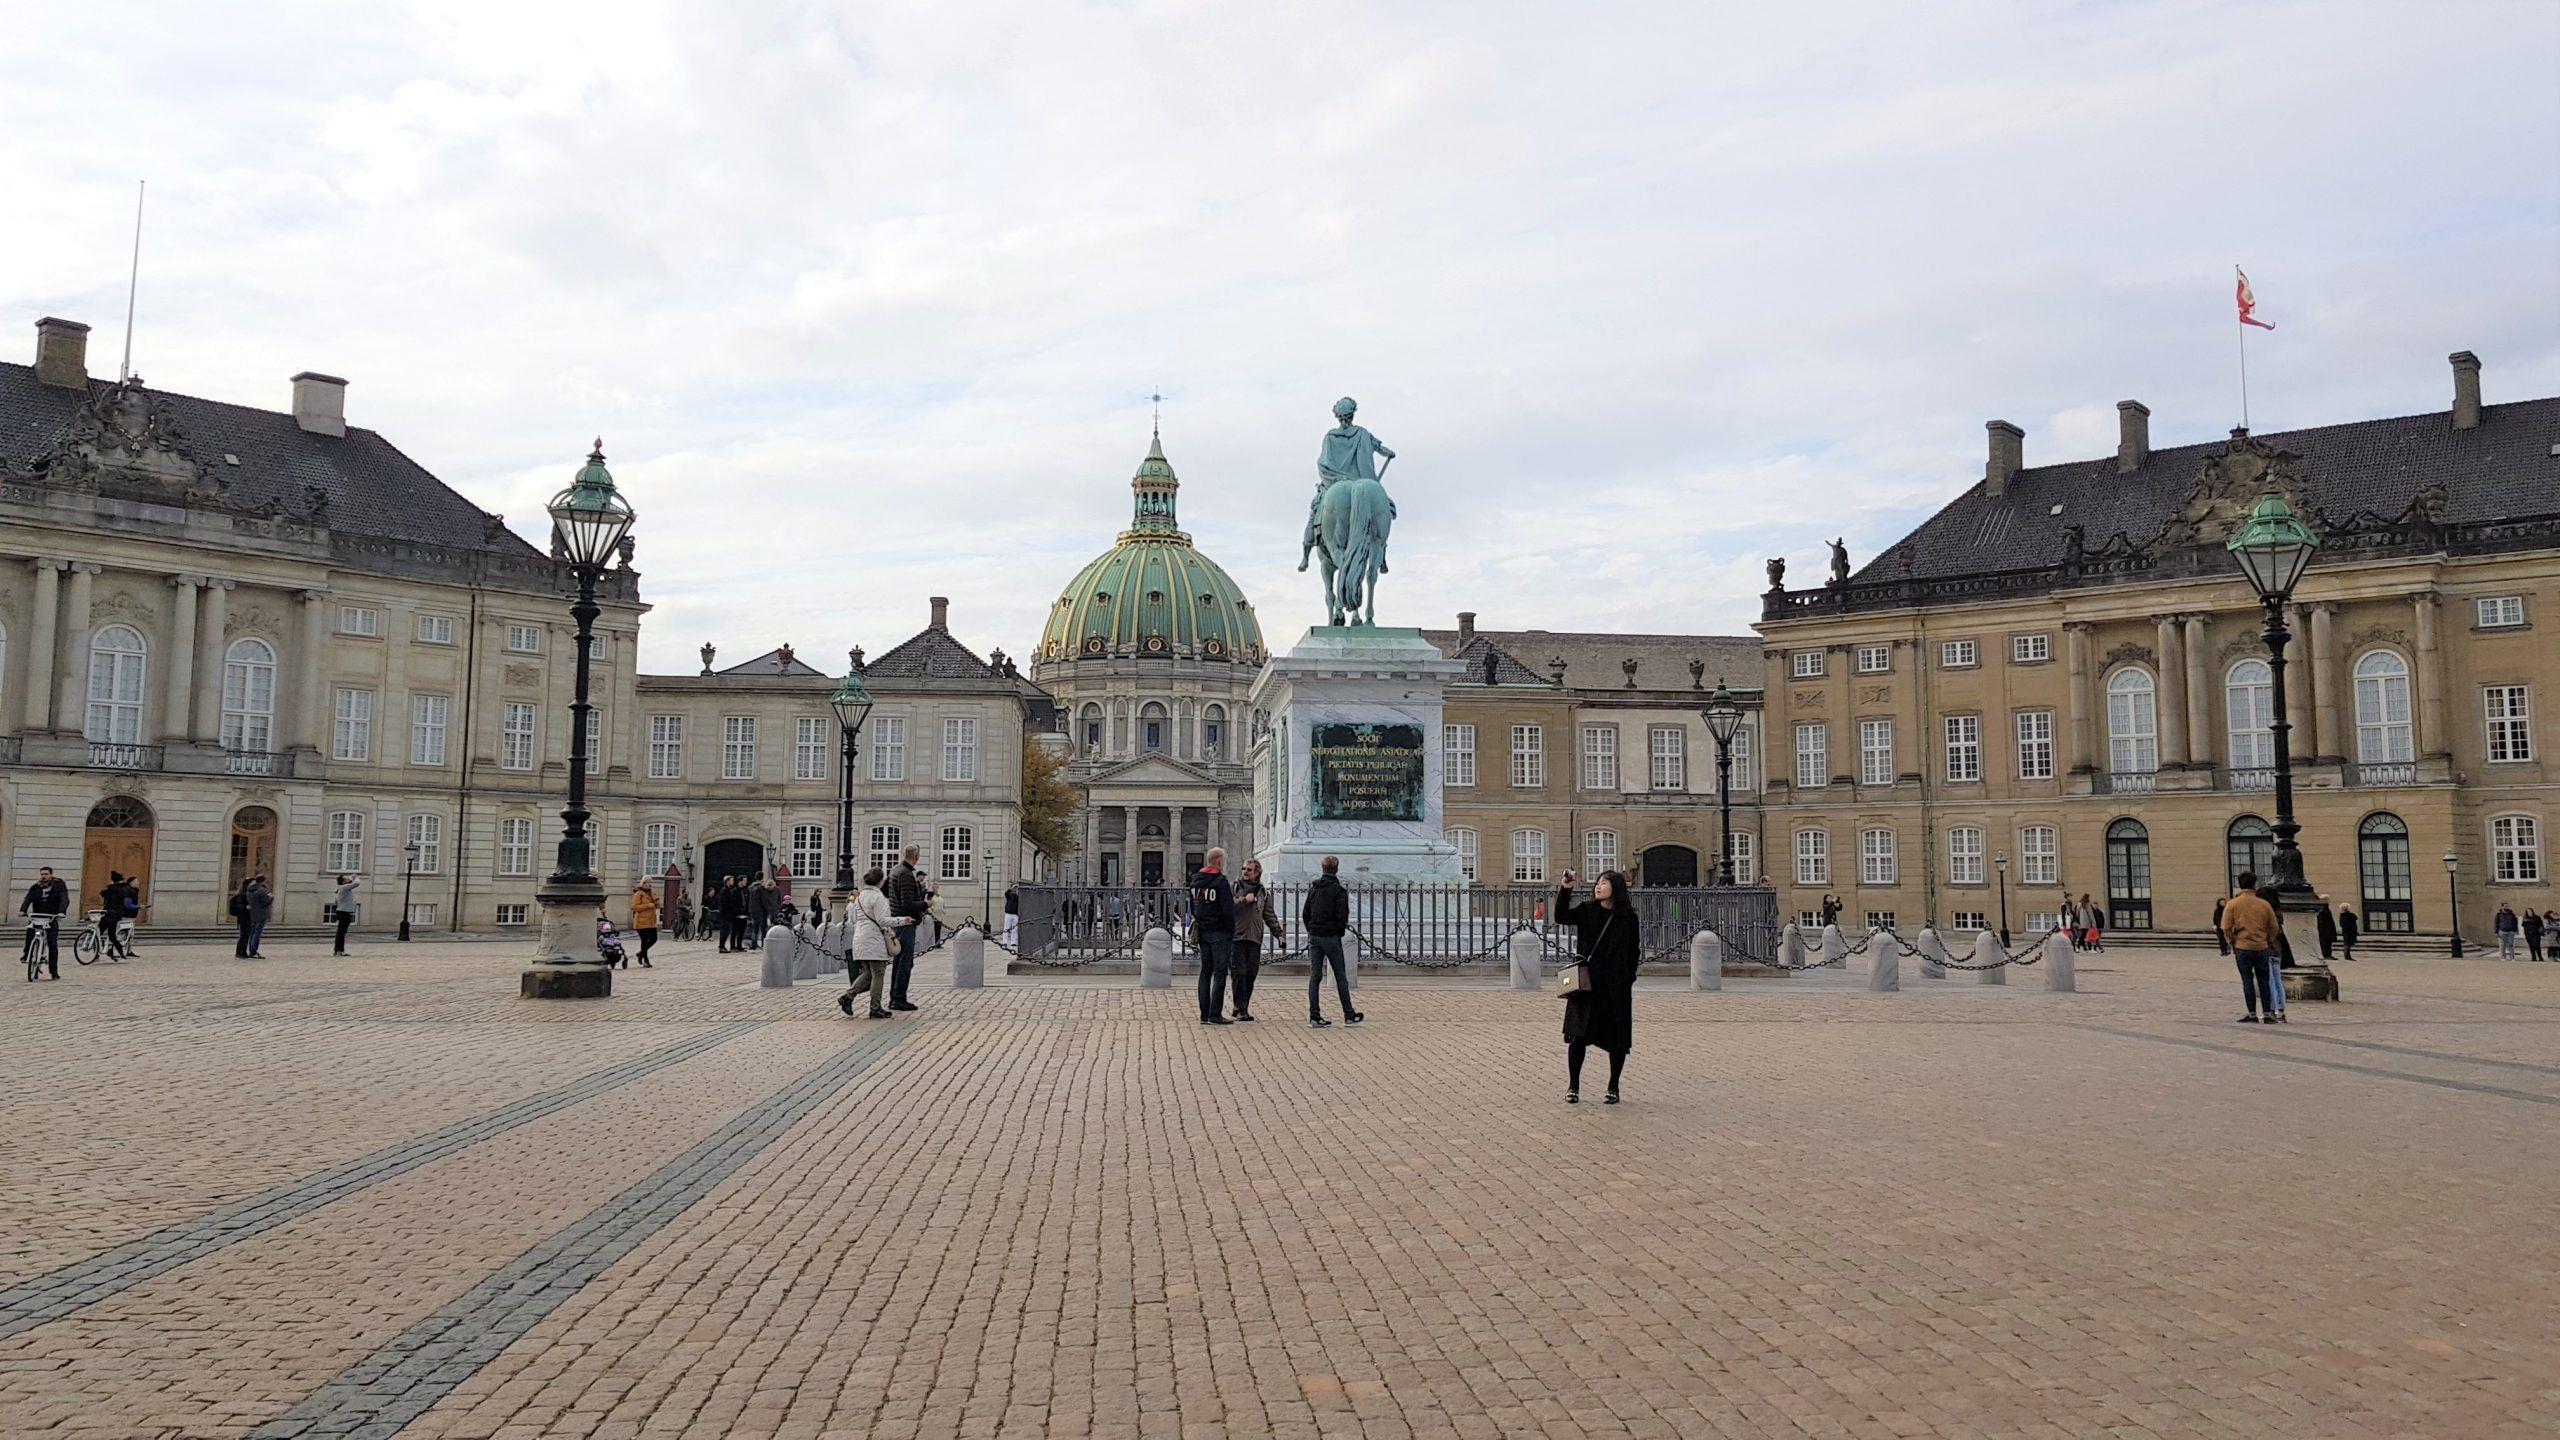 Palacio de Amalienborg en Copenhague con la iglesia de mármol de fondo.